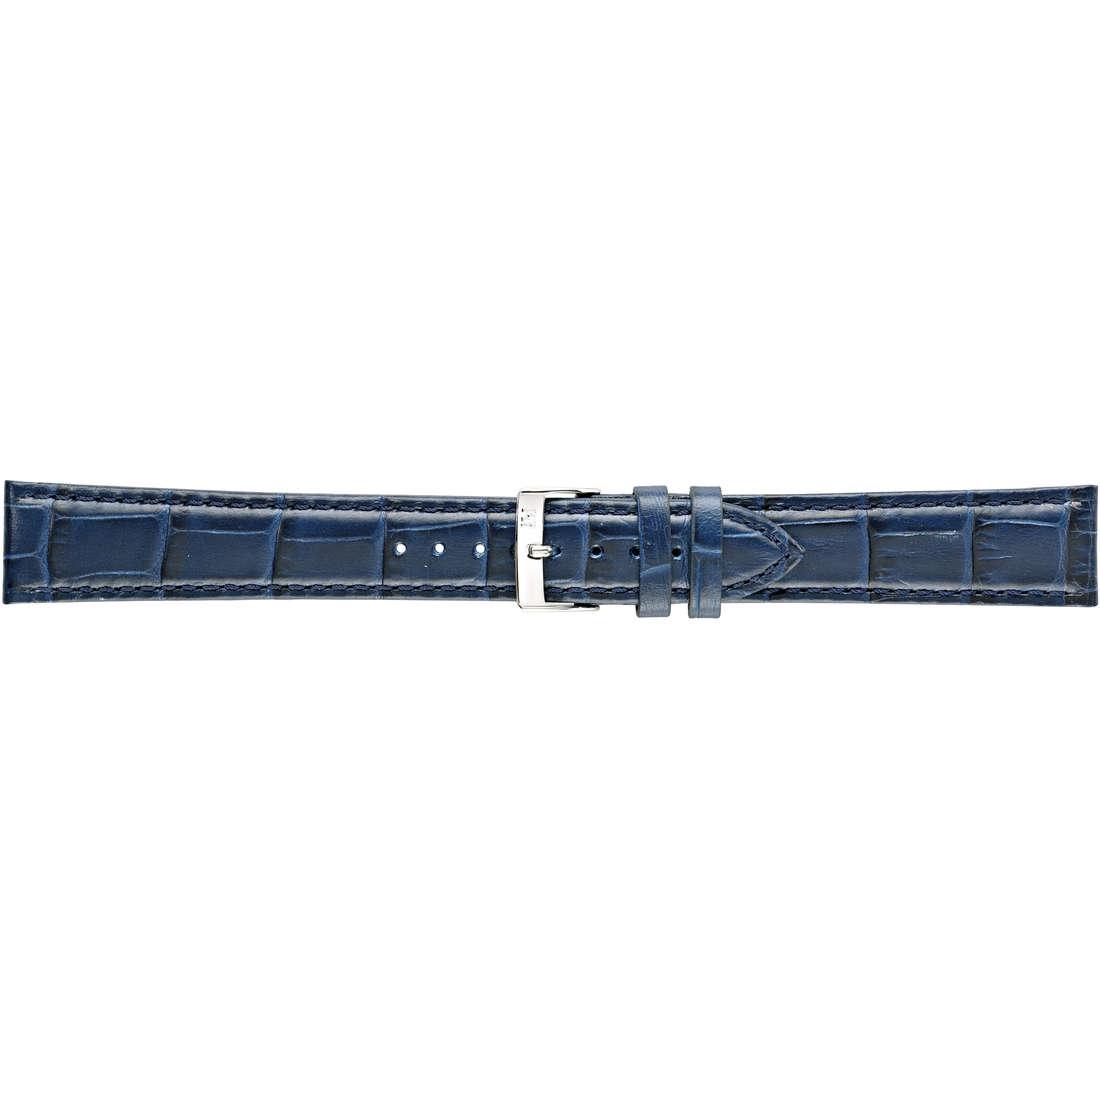 montre bande de montres unisex Morellato I Lunghi A01Y2269480061CR24